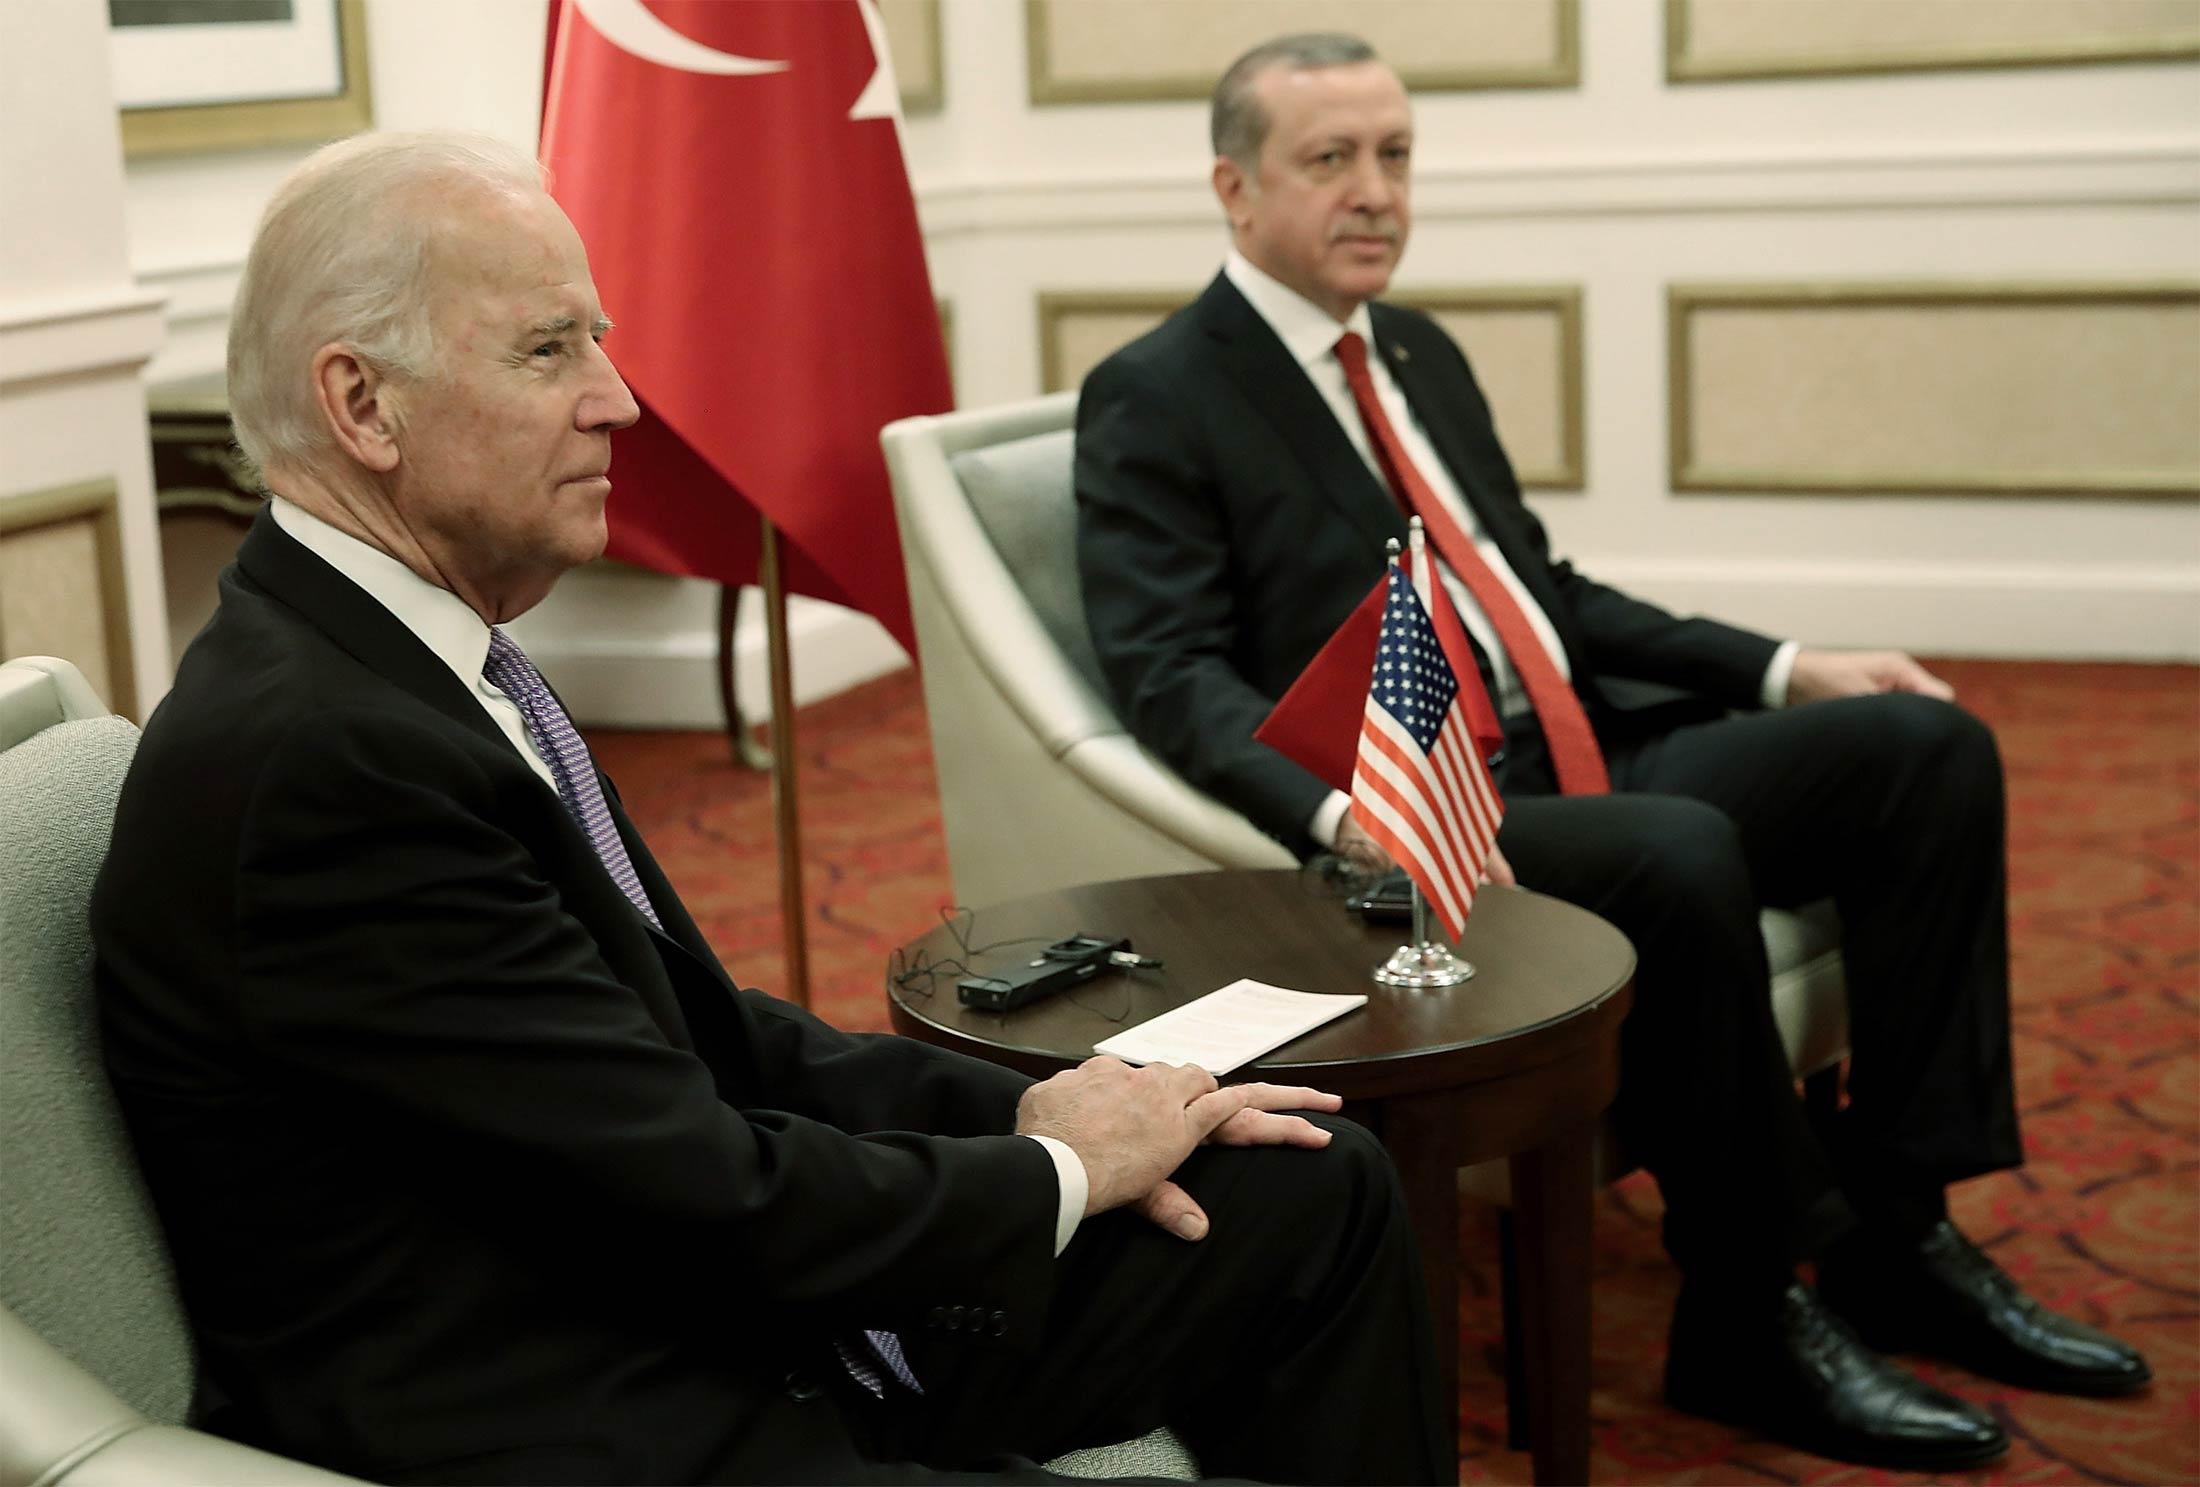 Joe Biden speaks to Recep Tayyip Erdoğan ahead of Armenia decision